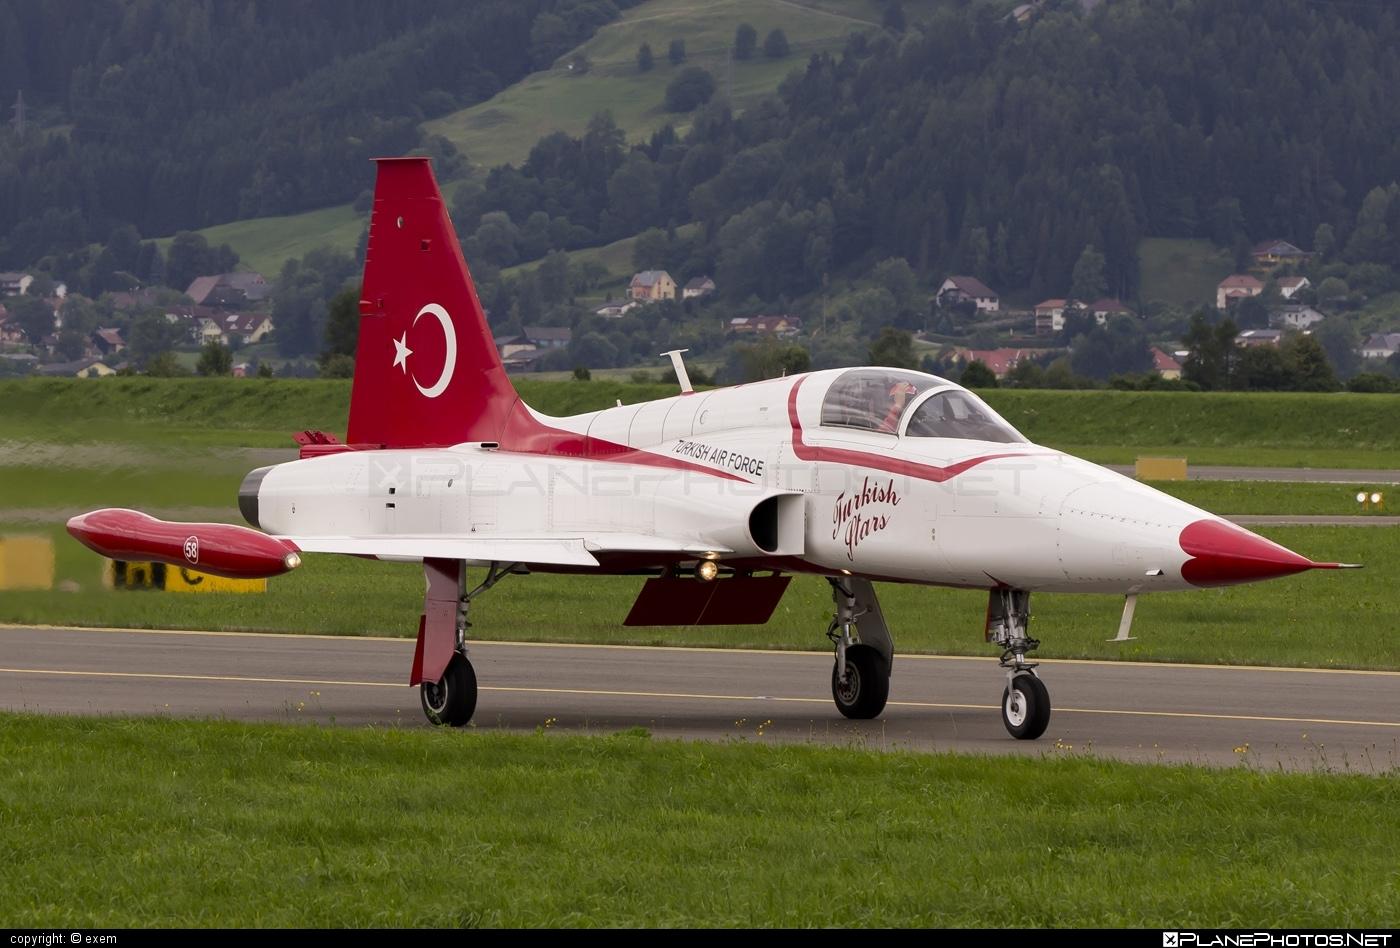 Canadair NF-5A Freedom Fighter - 71-3058 operated by Türk Hava Kuvvetleri (Turkish Air Force) #canadair #turkishairforce